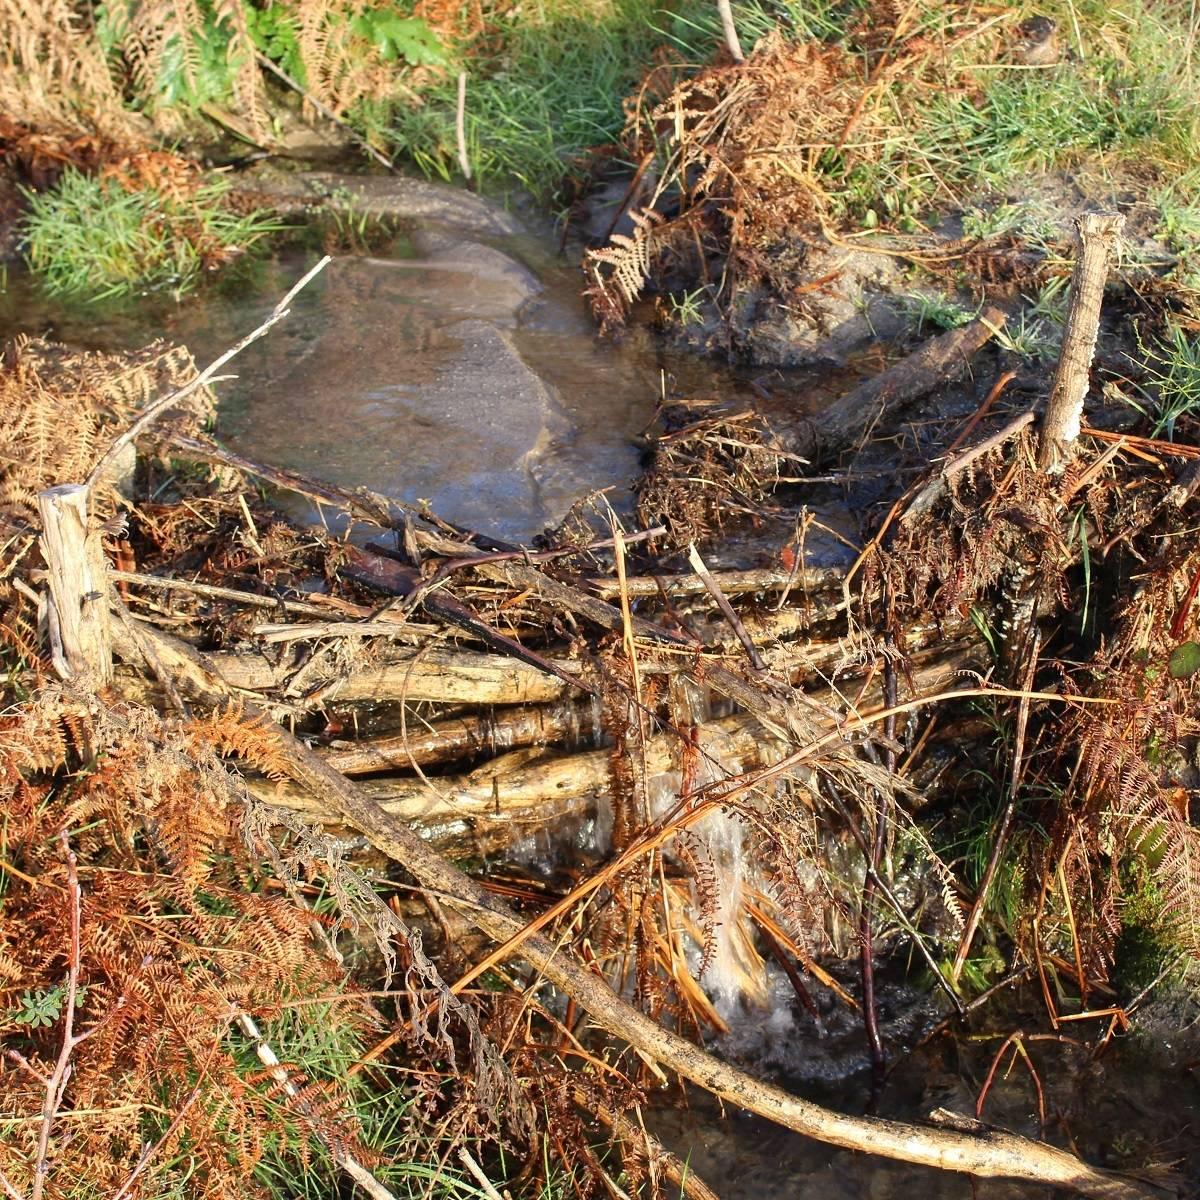 A man made dam in a stream built from fallen branches